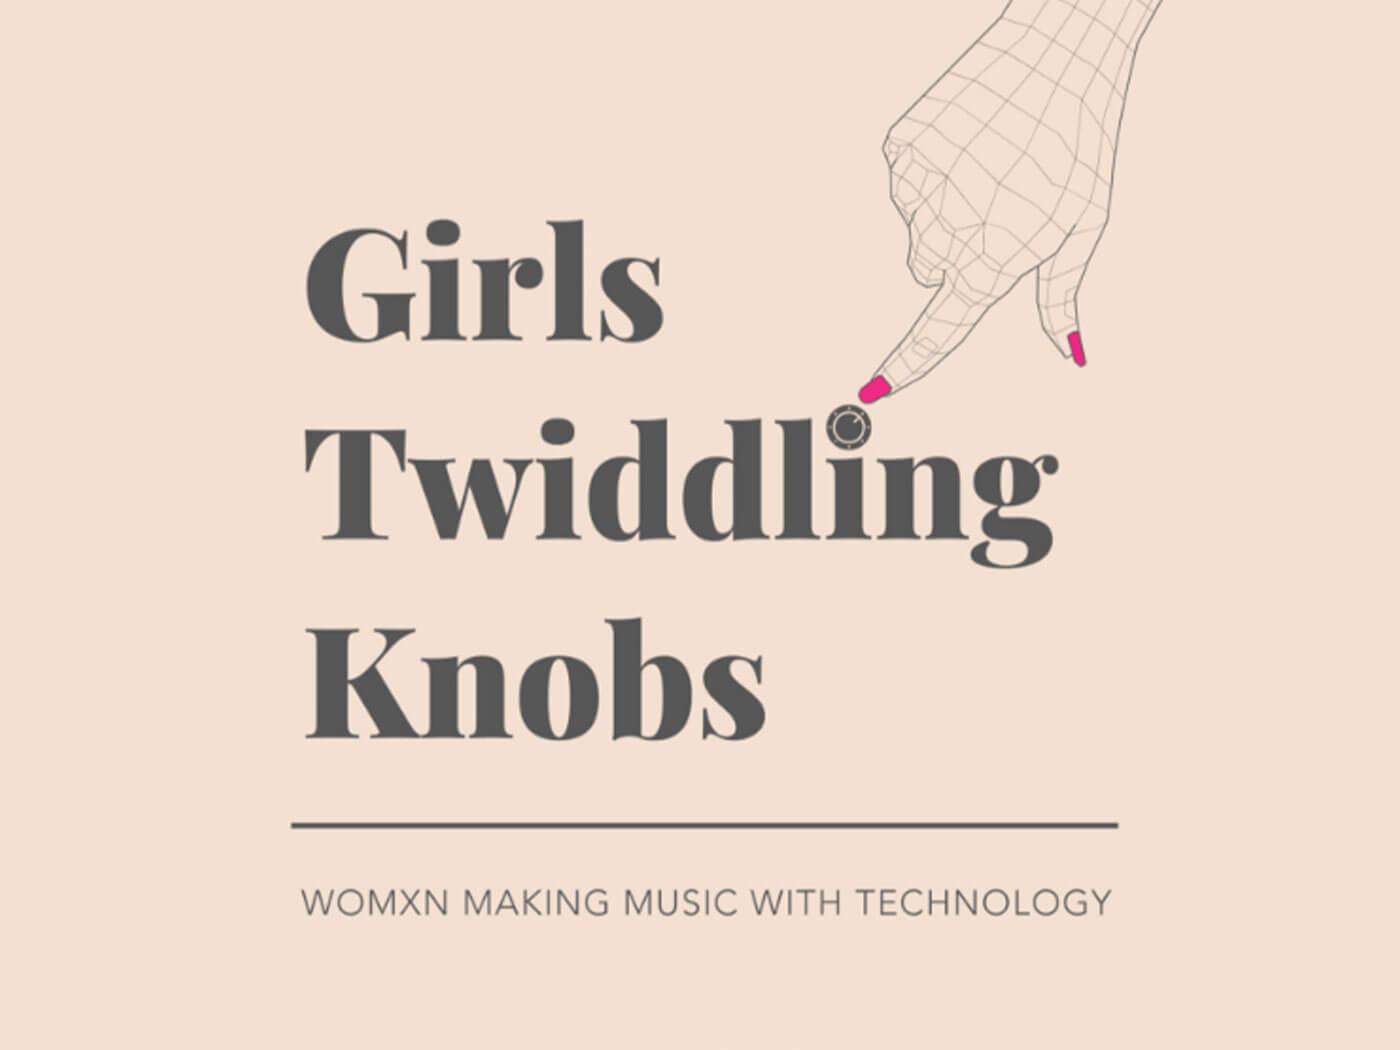 Girls Twiddling Knobs